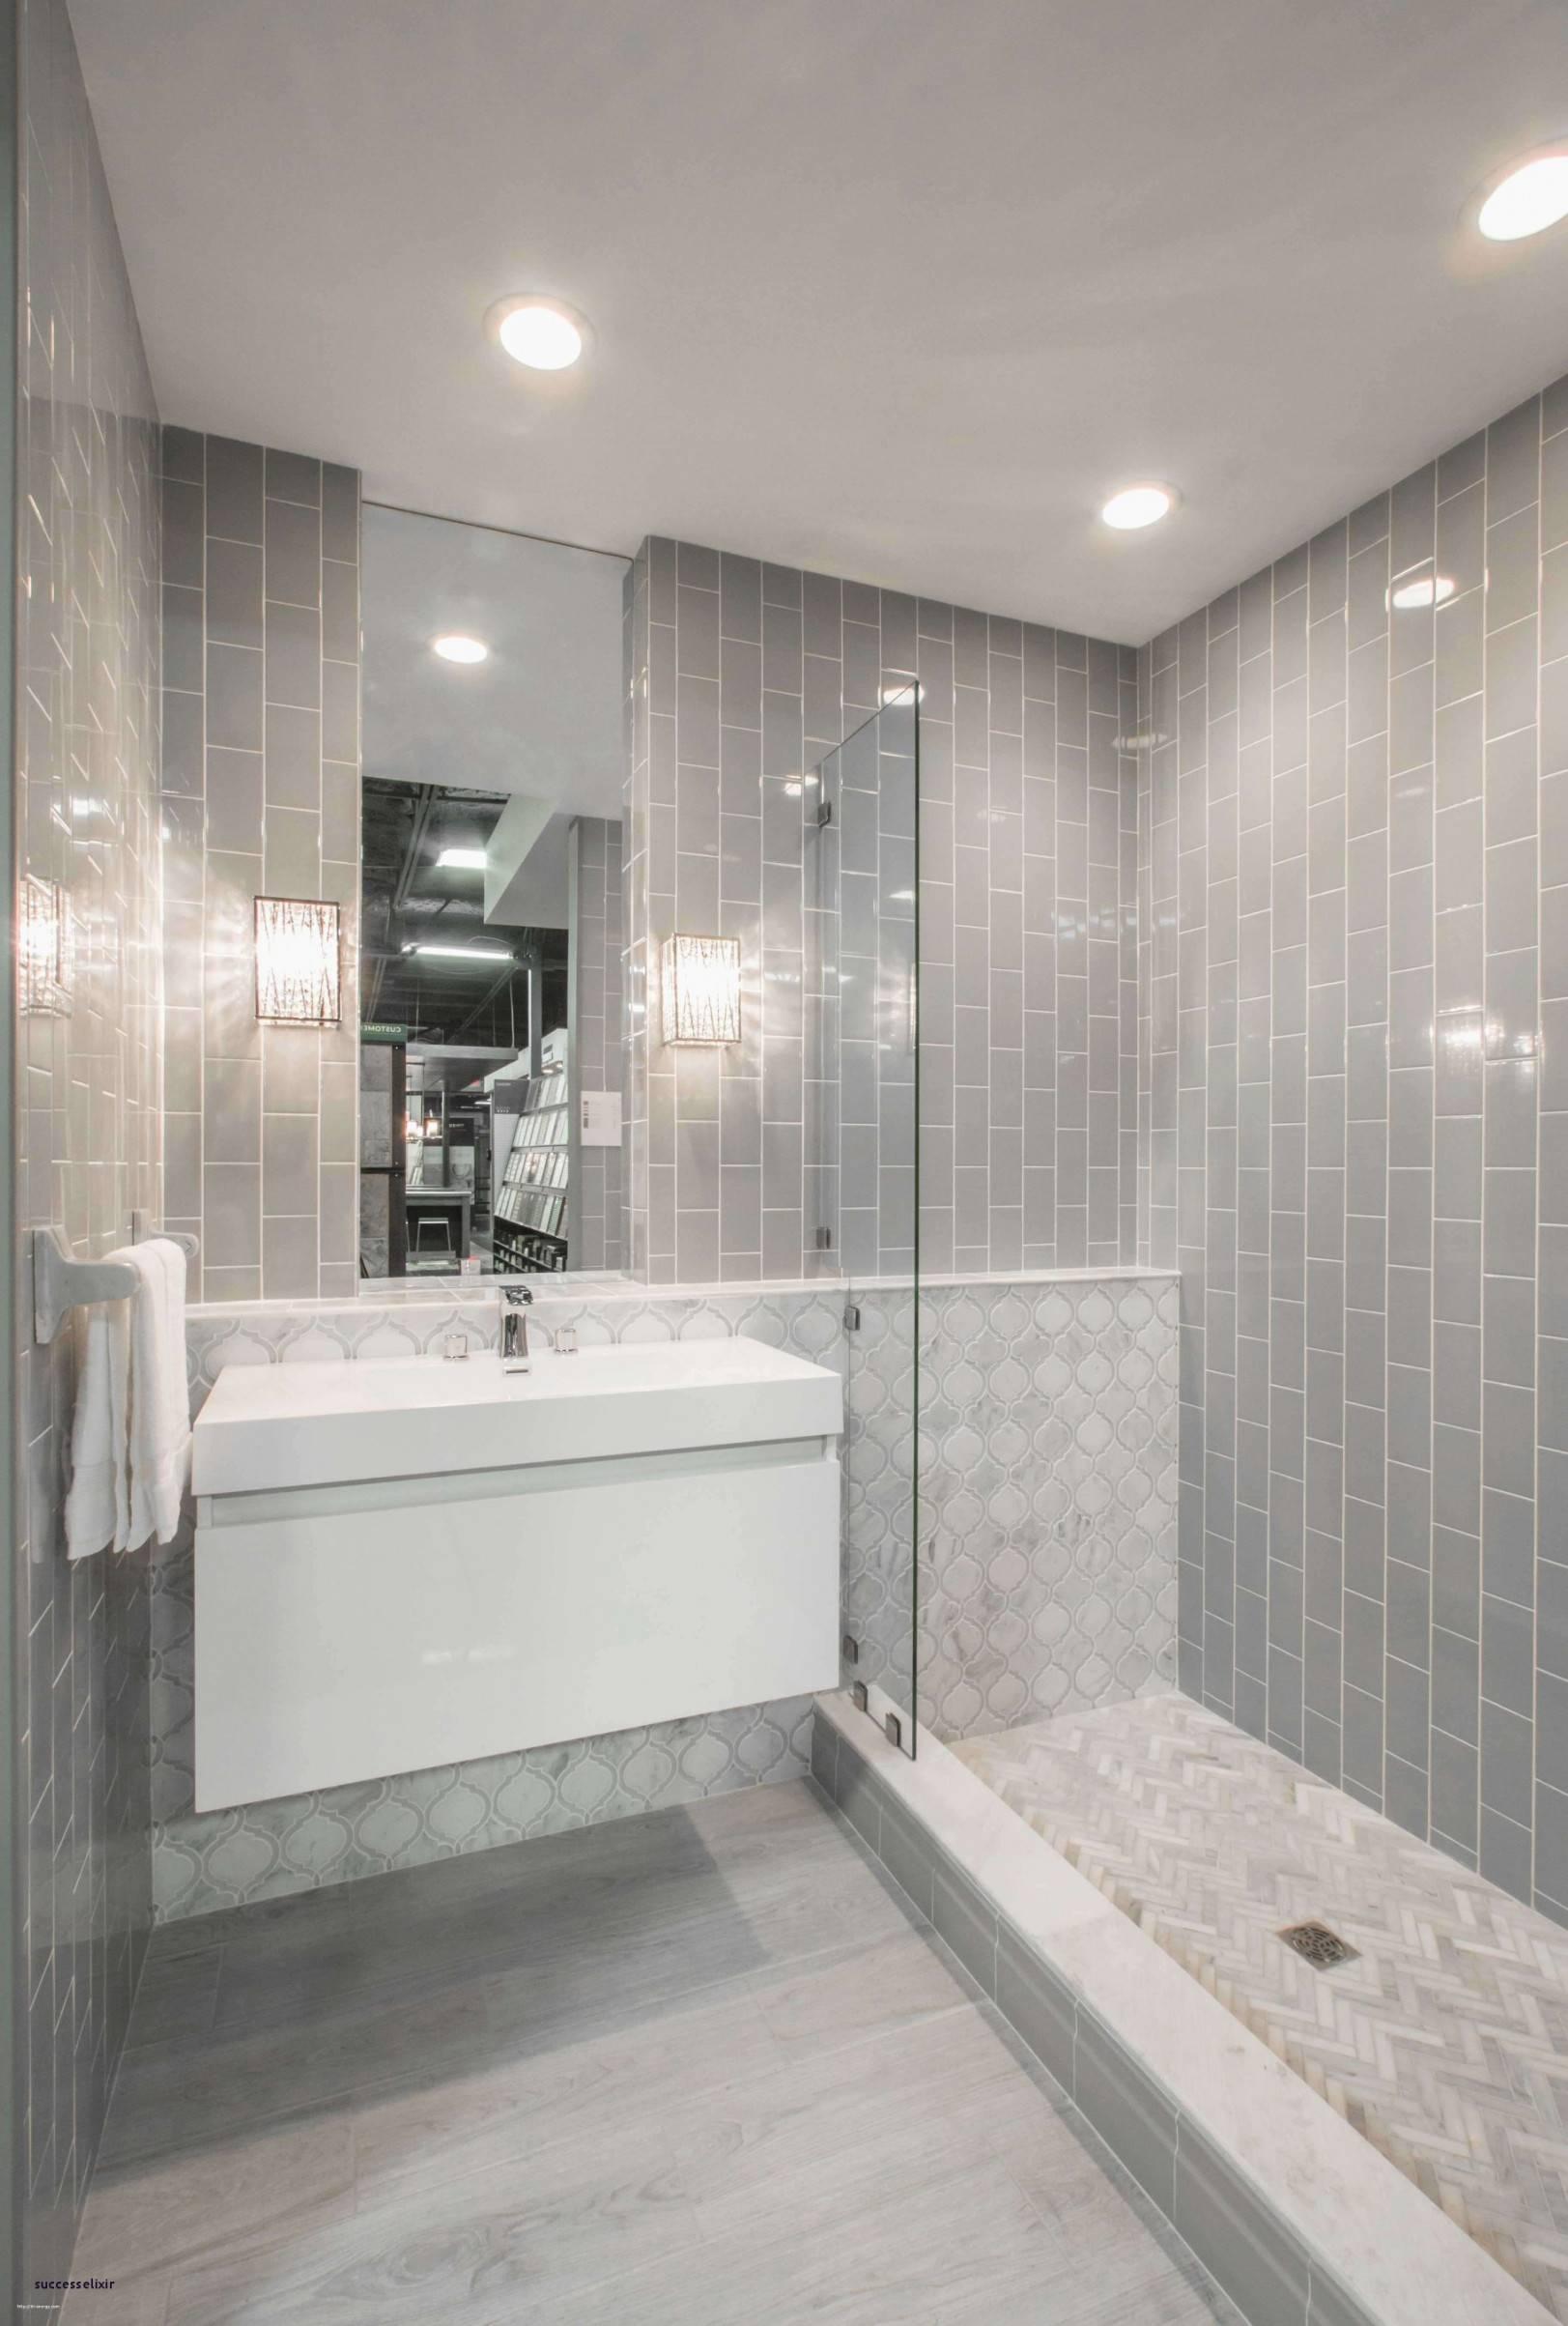 master bathroom layout ideas luxurious master bathroom layout ideas of master bathroom layout ideas